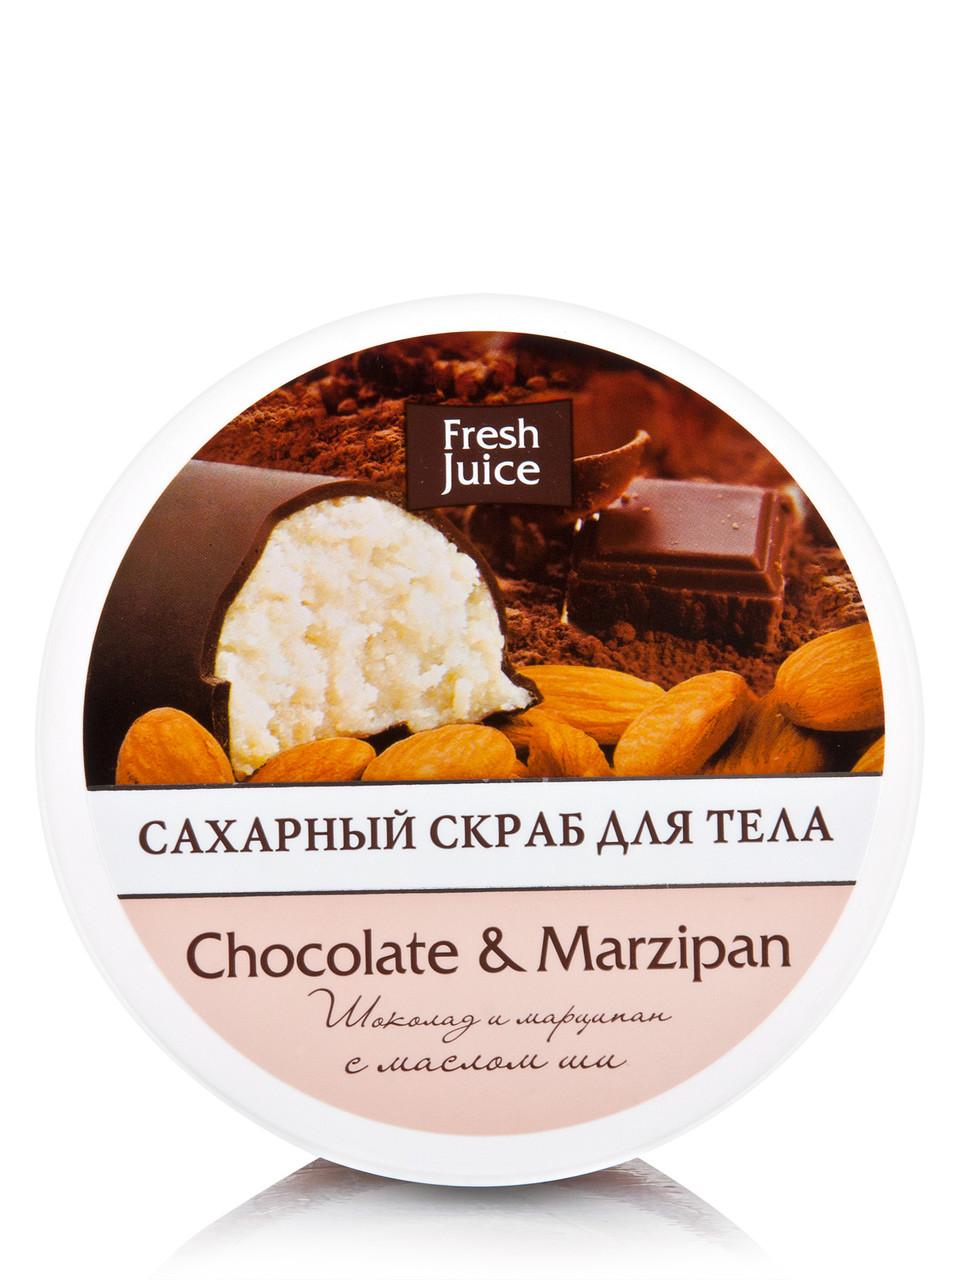 "Сахарный скраб для тела Chocolate & Мarzipan ТМ "" Fresh Juice"" ,225 мл"